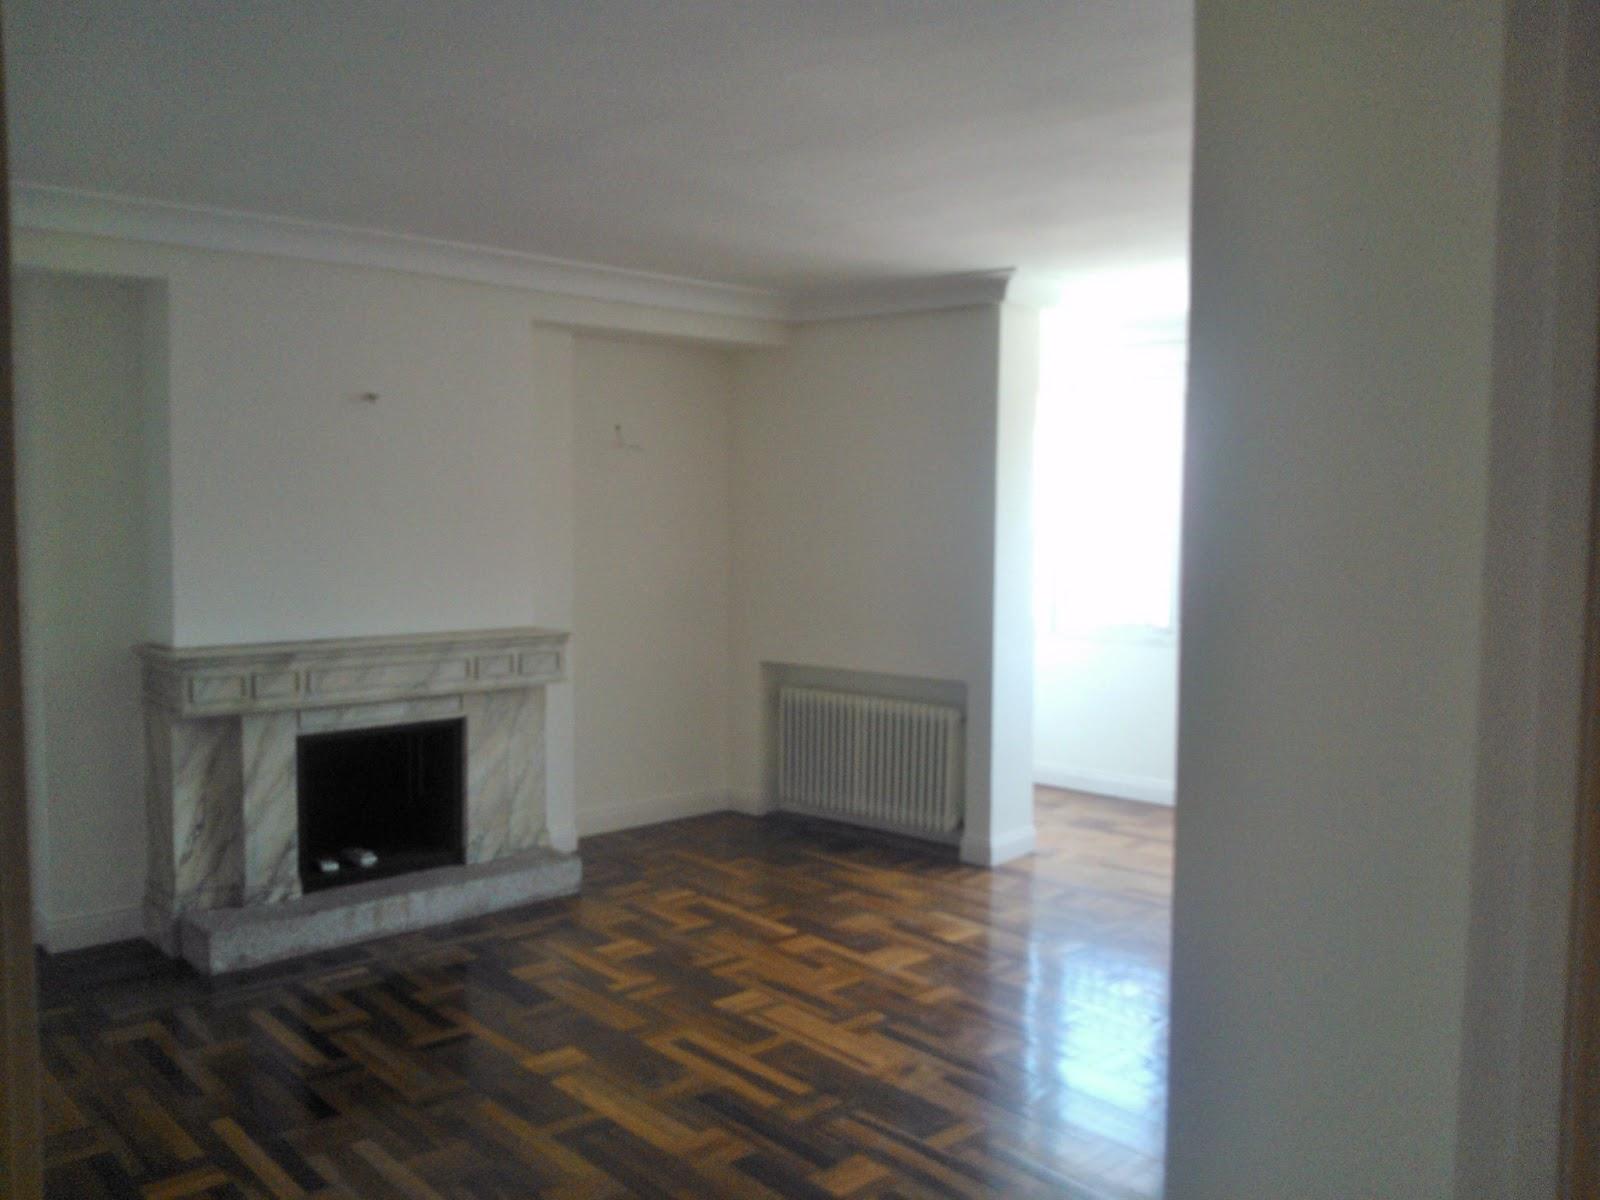 Mondecor s l piso pintado en pintura plastica blanca - Pintura plastica blanca ...